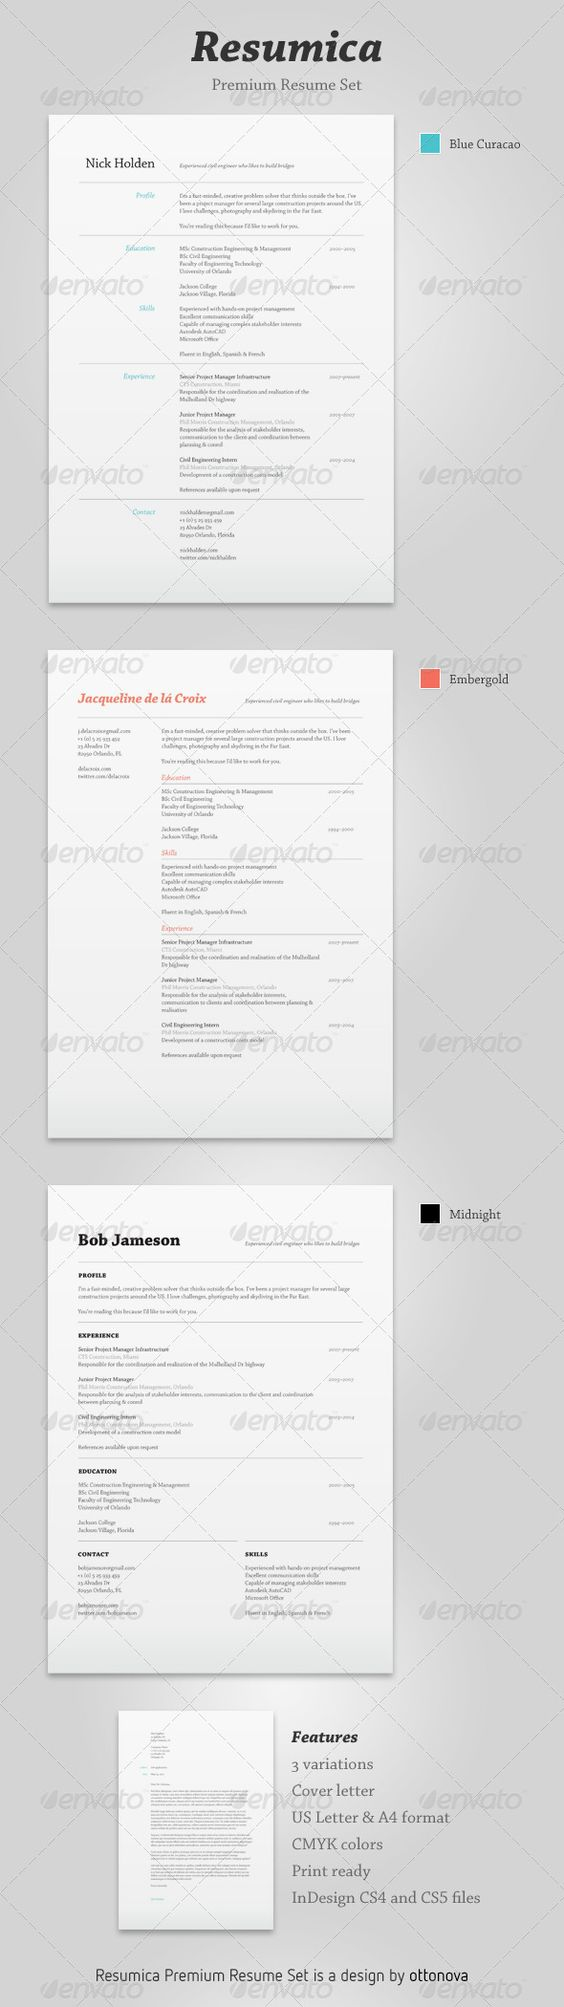 resumica resume set adobe creative resume and resume cv resumica resume set resumes stationery here graphicriver